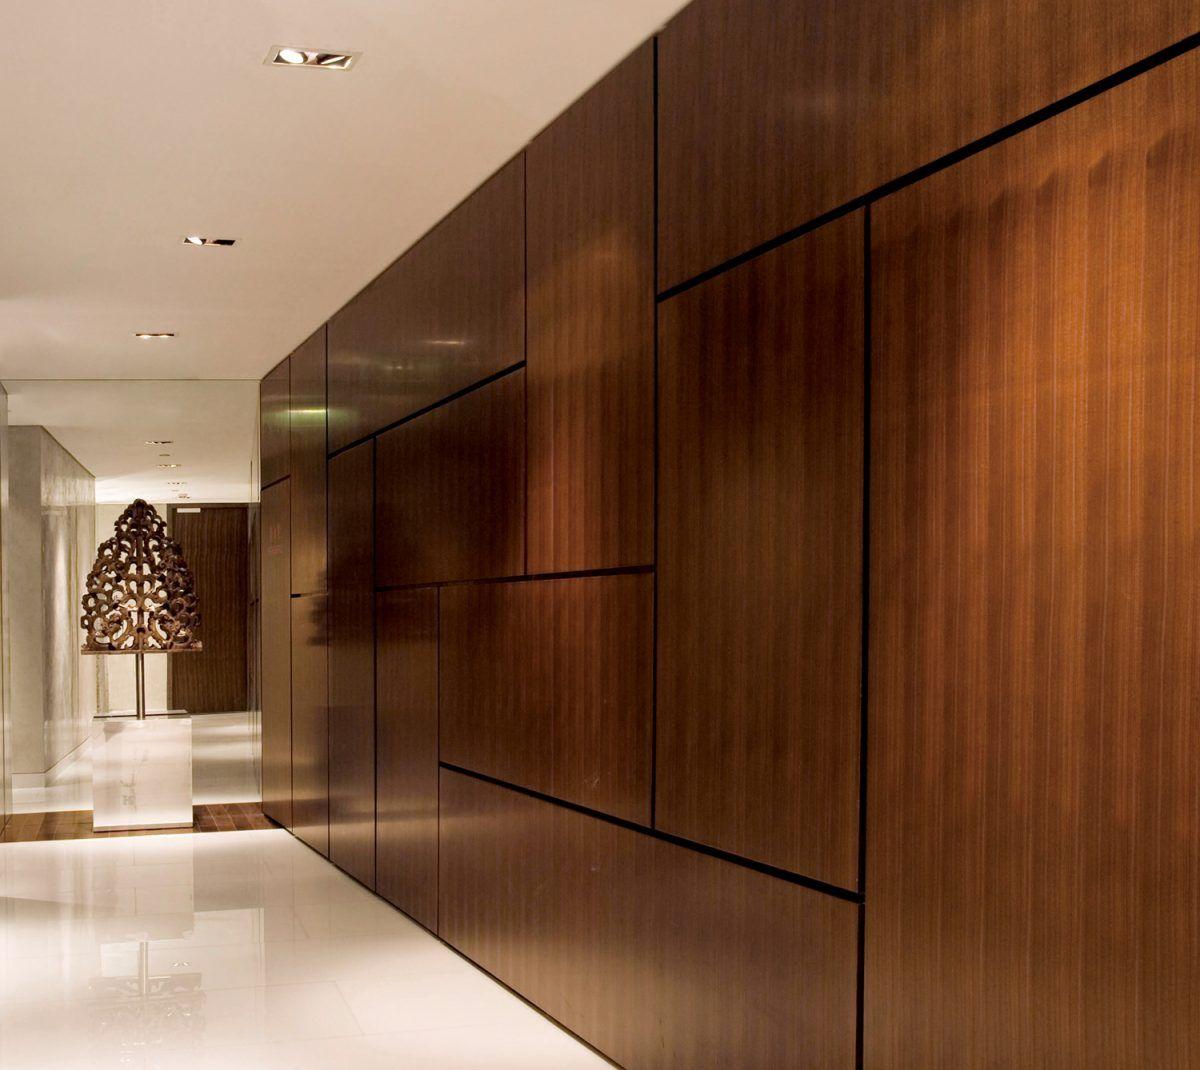 Interior Design Architecture And Engineering